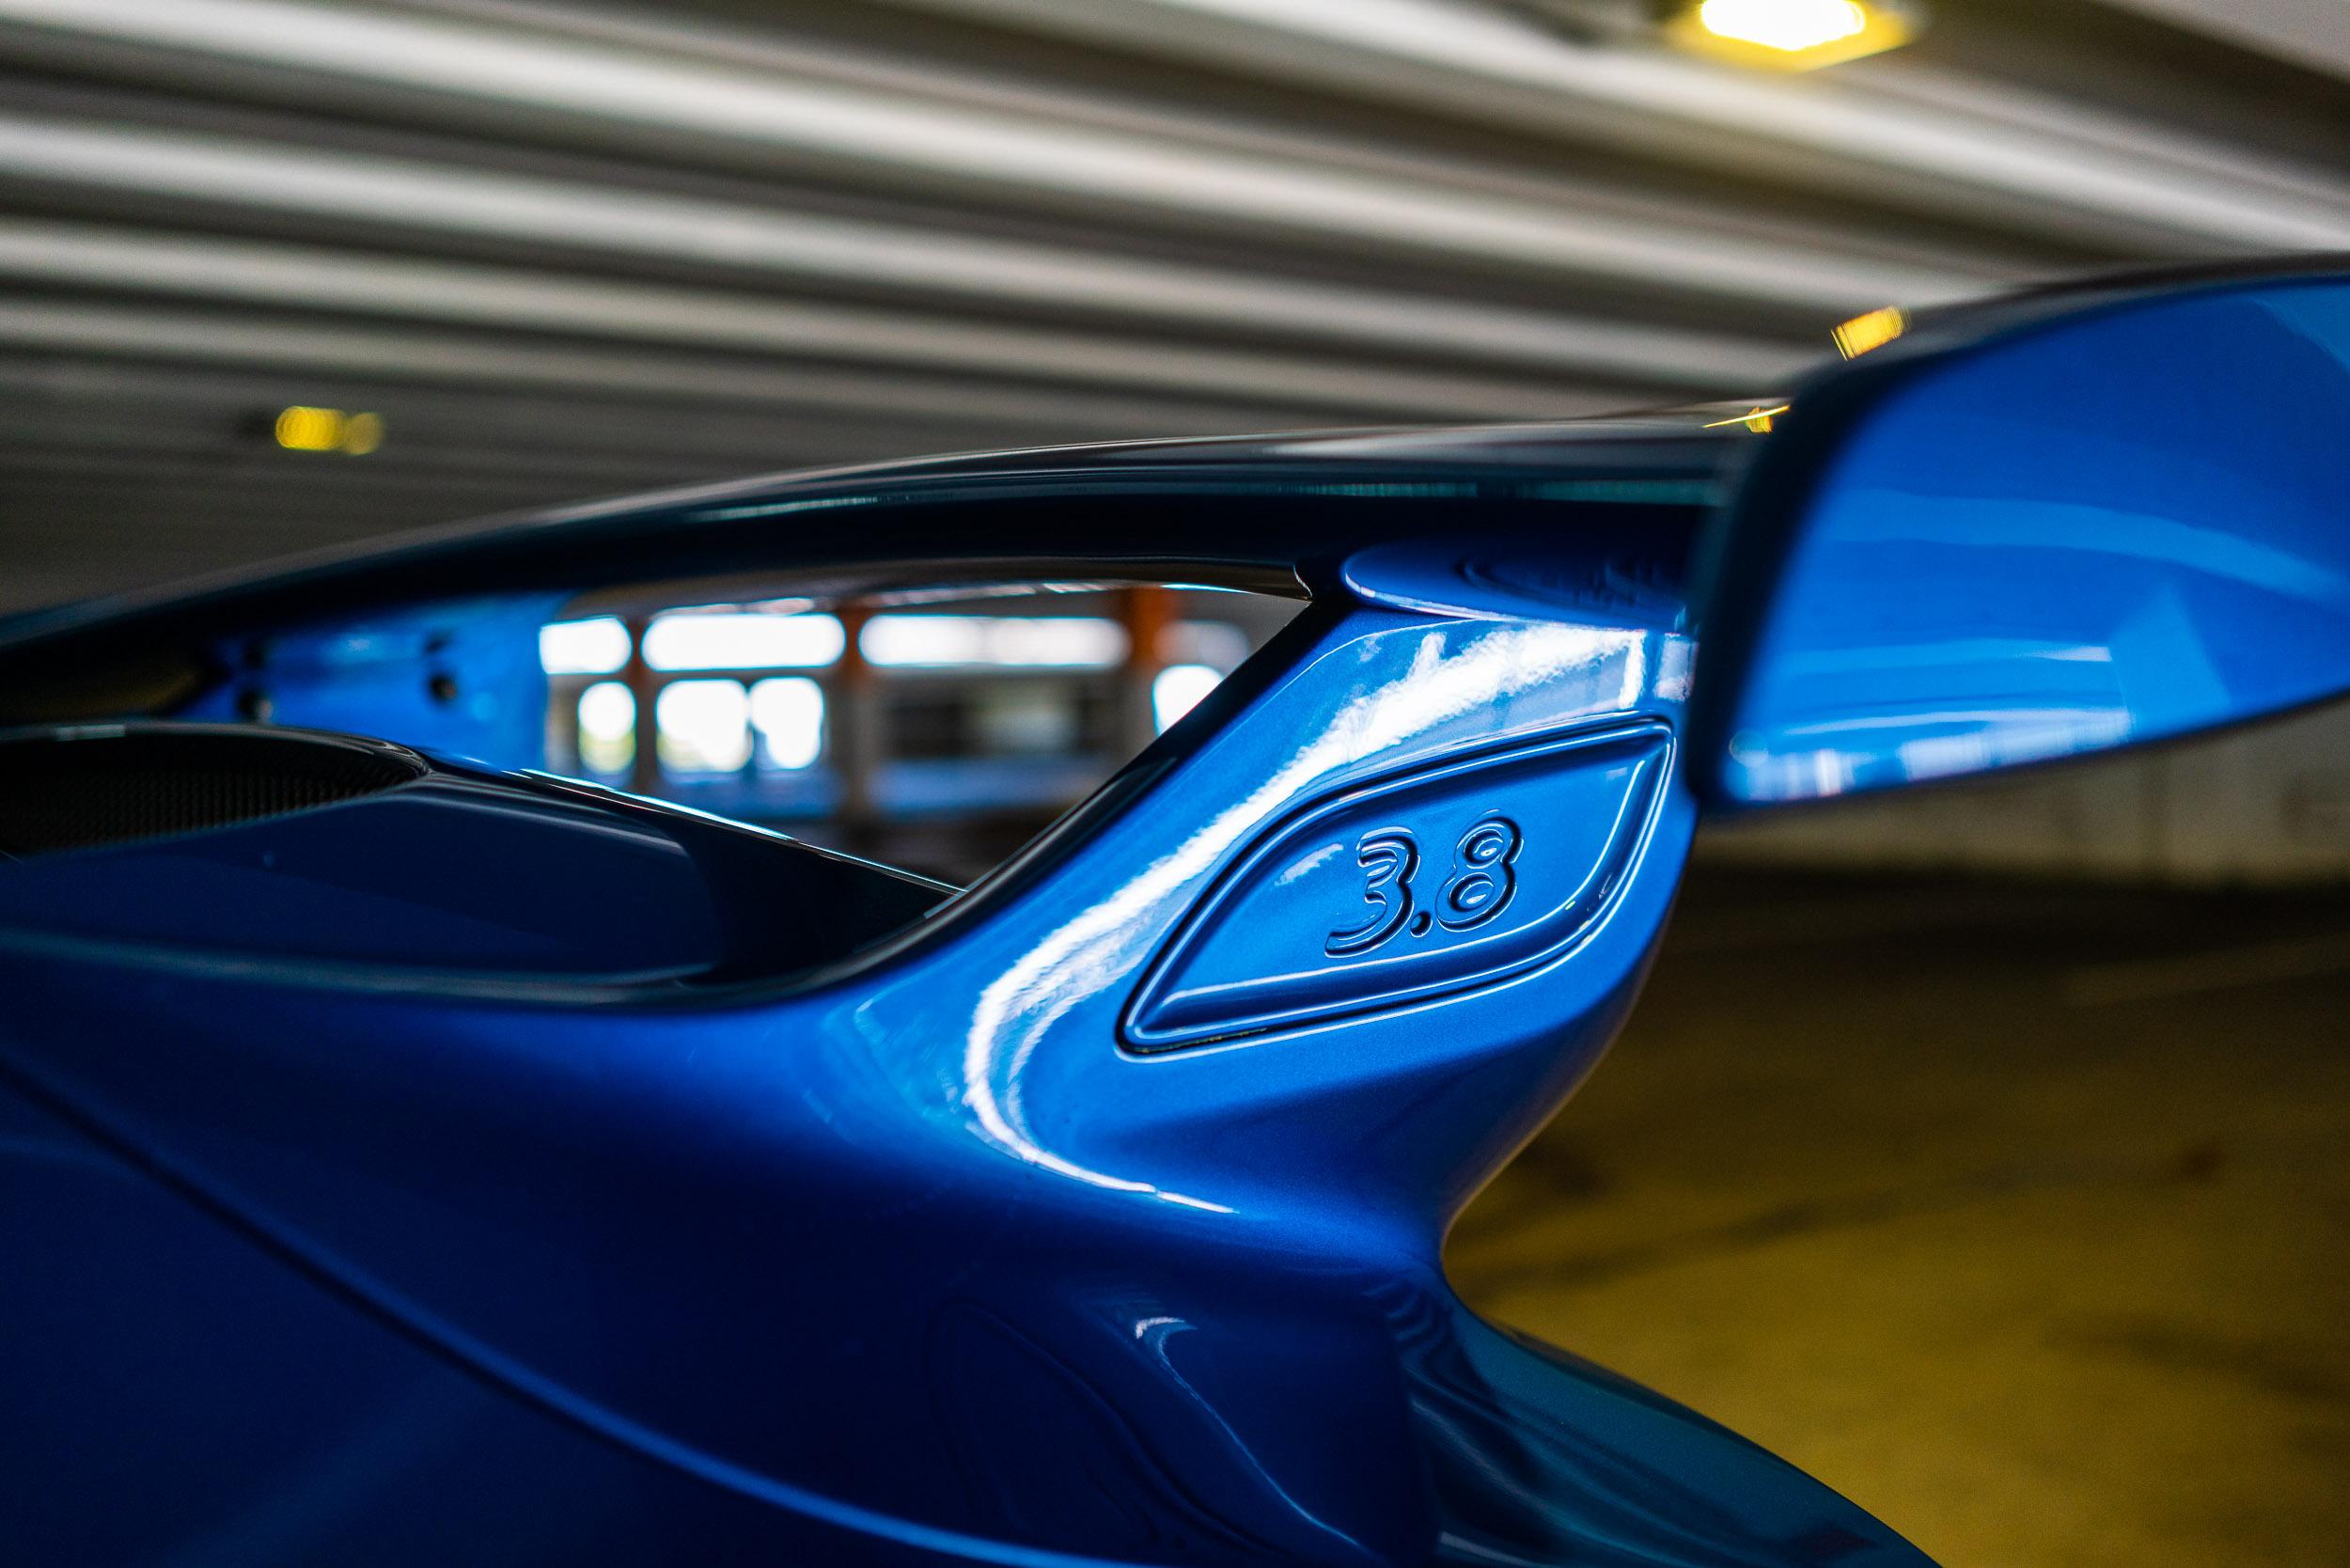 porsche-911-gt3-991-rear-wing.jpg